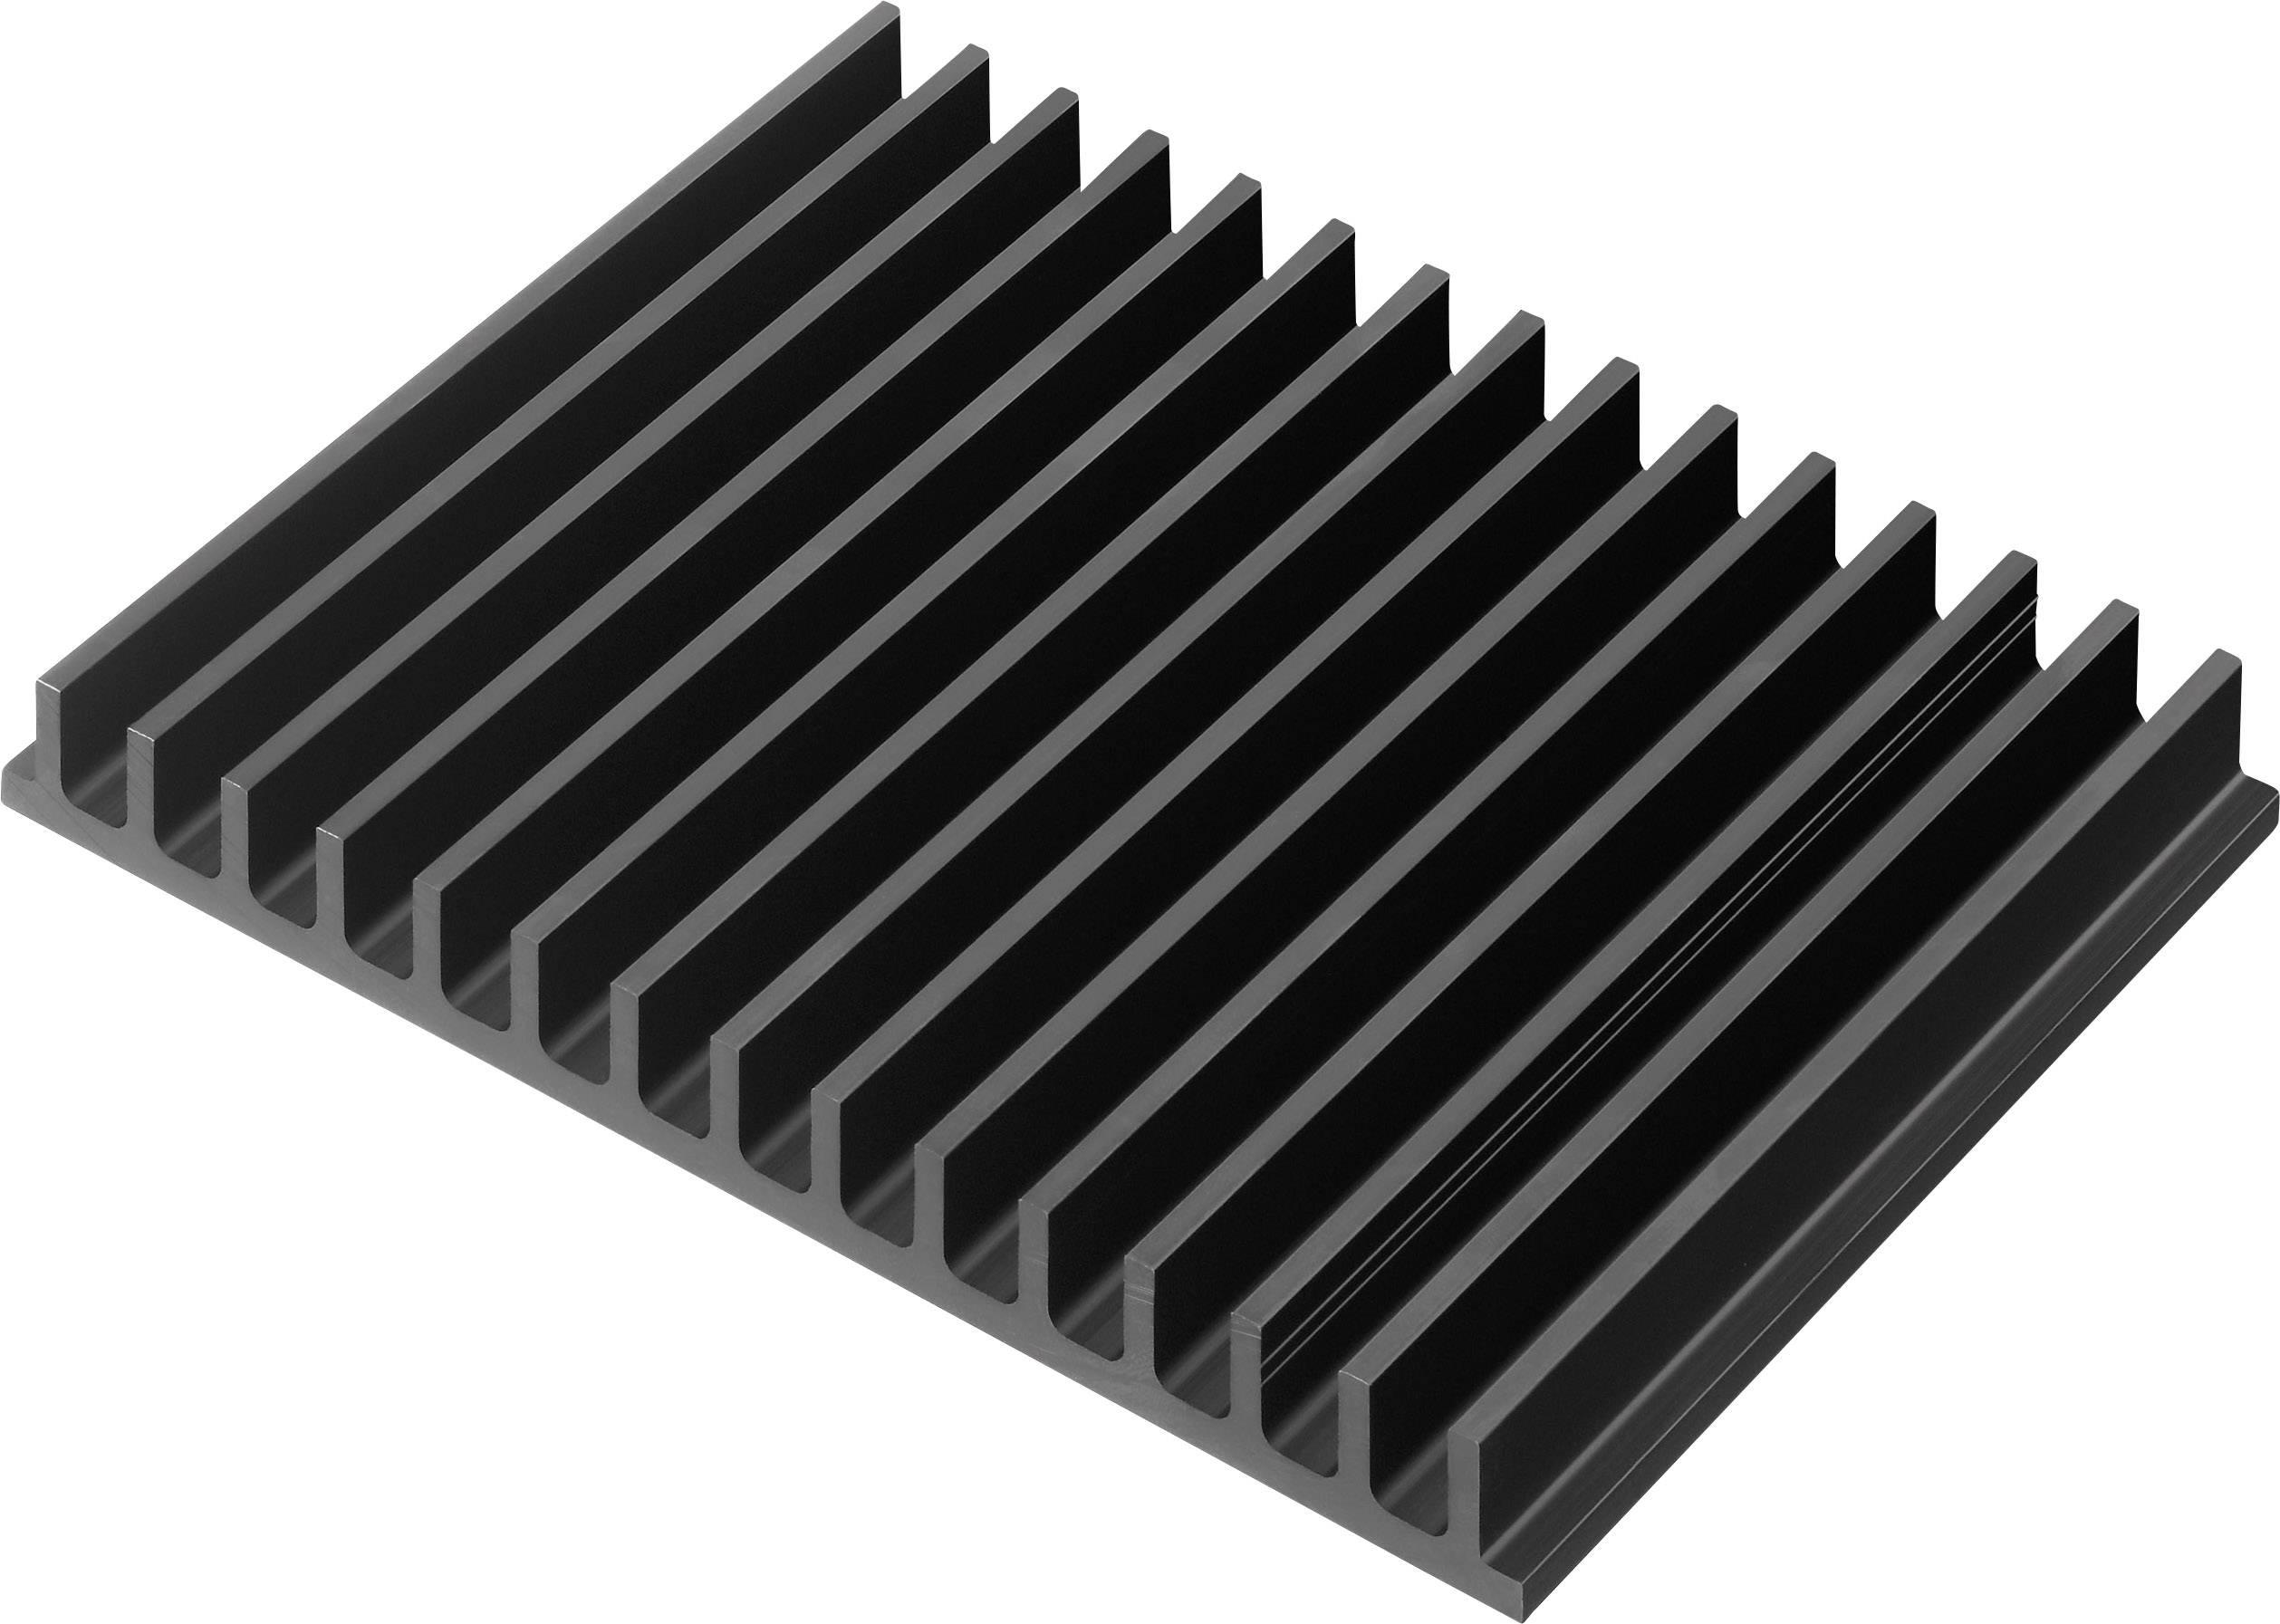 Profilový chladič Contrinex CTX44/100, 159 x 15 x 100 mm, 1,7 K/W